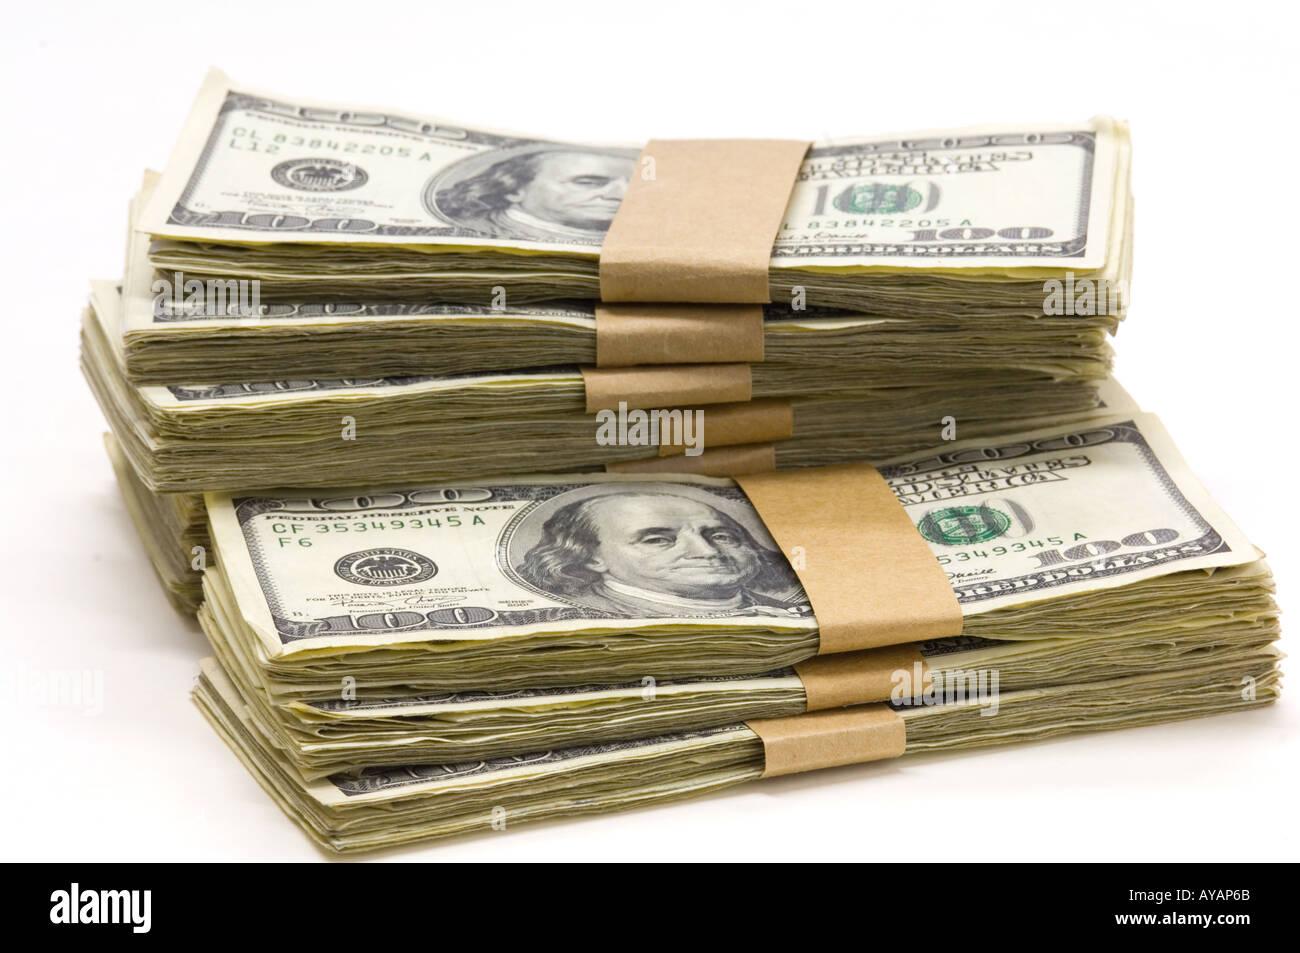 Packs de 100 billetes de dólar US concepto Imagen De Stock